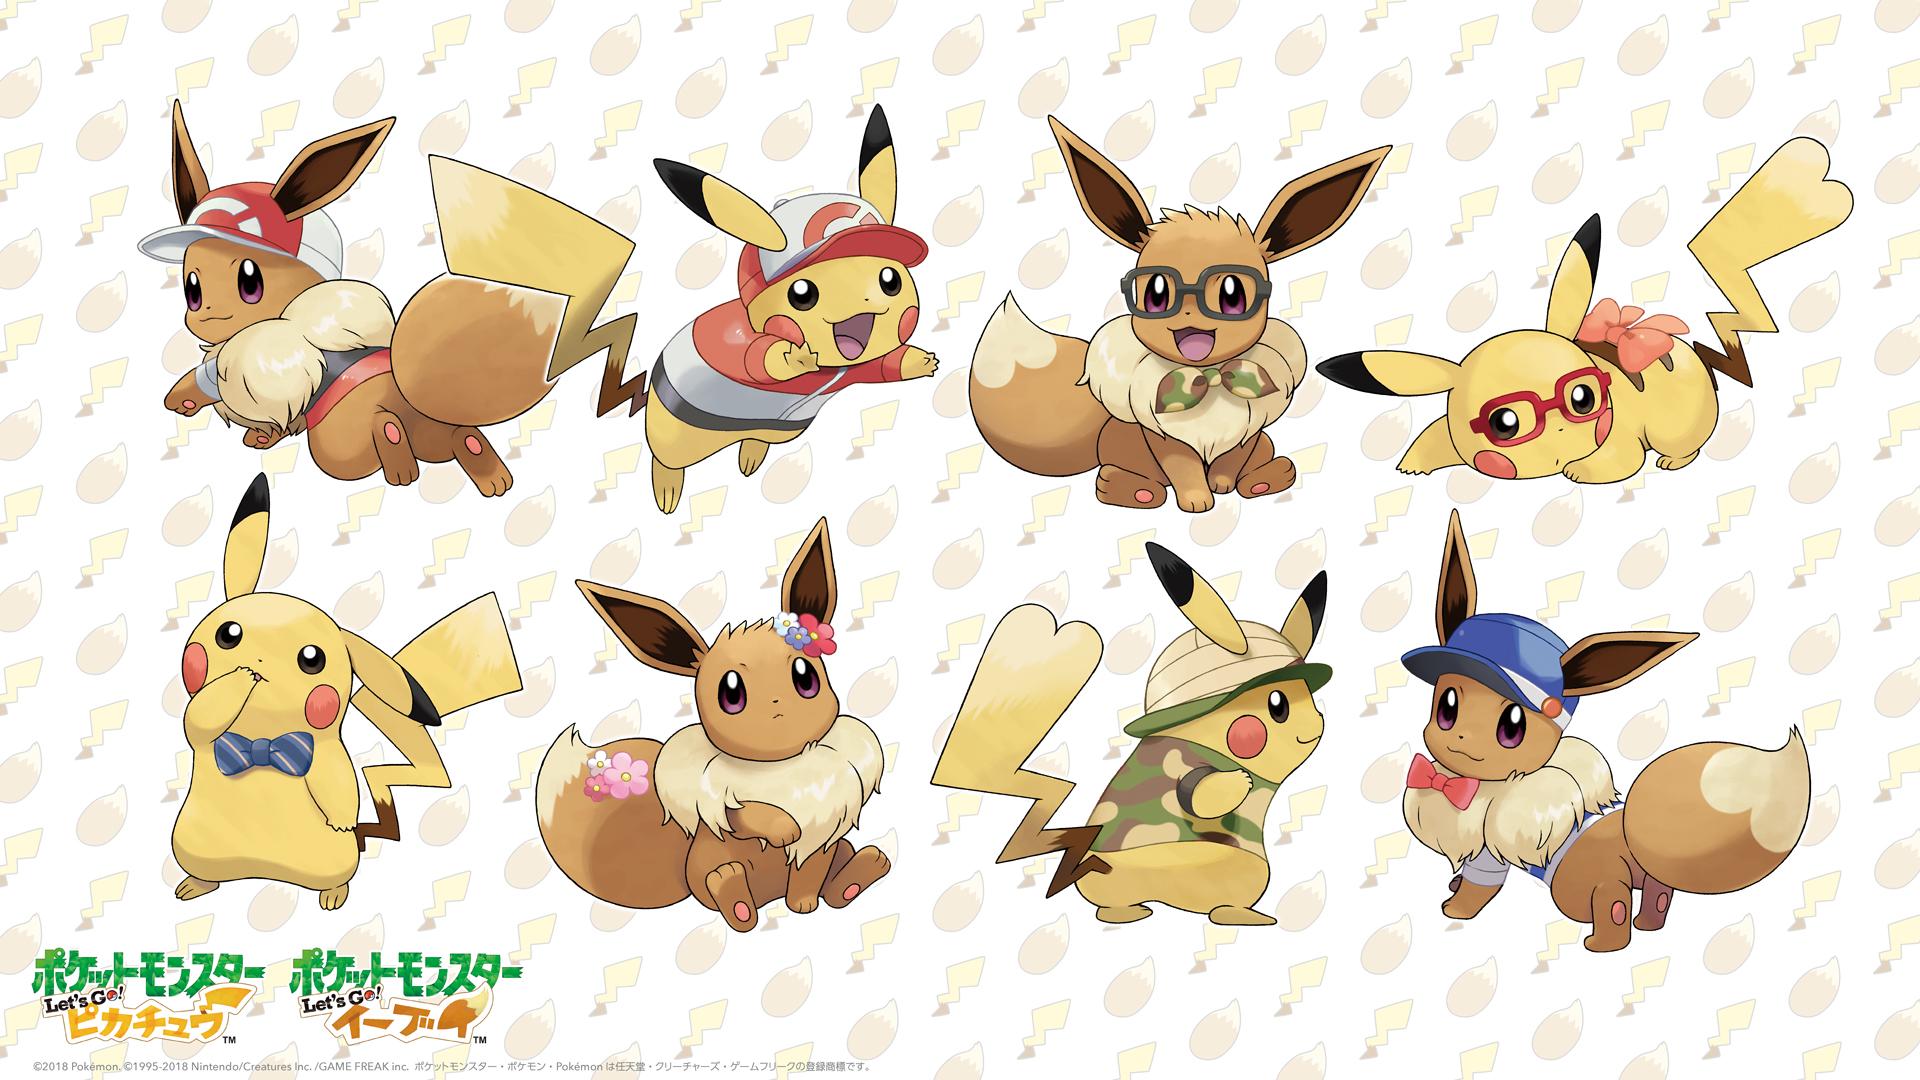 Hair Style Eevee: Download This Pokemon Let's GO Pikachu/Eevee Wallpaper For